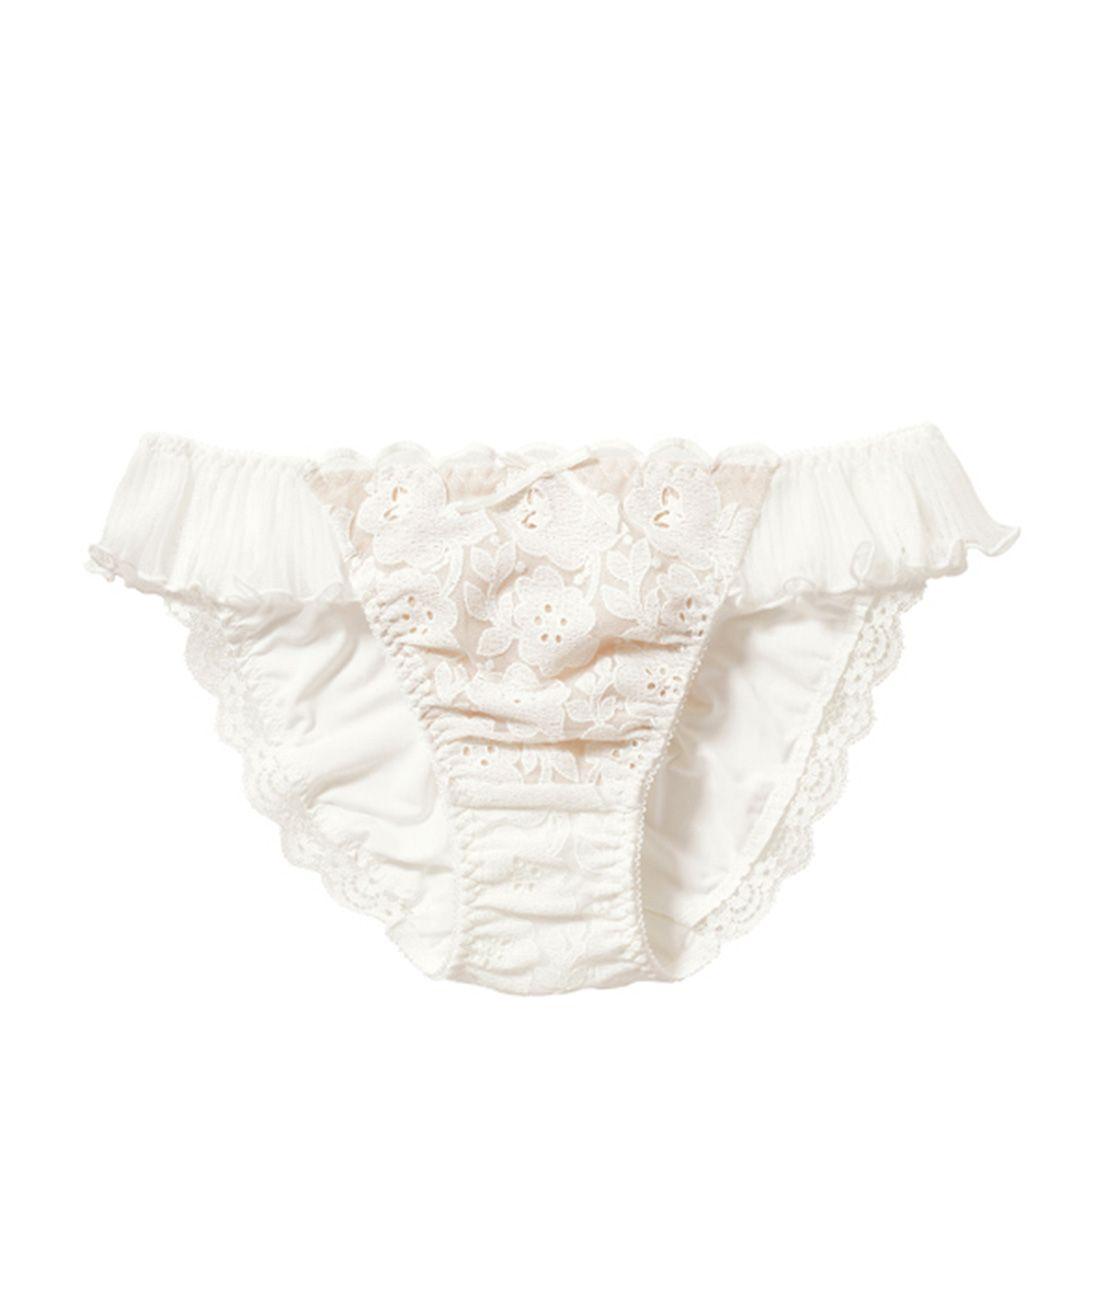 Deco Rutan Sheer pleated panty